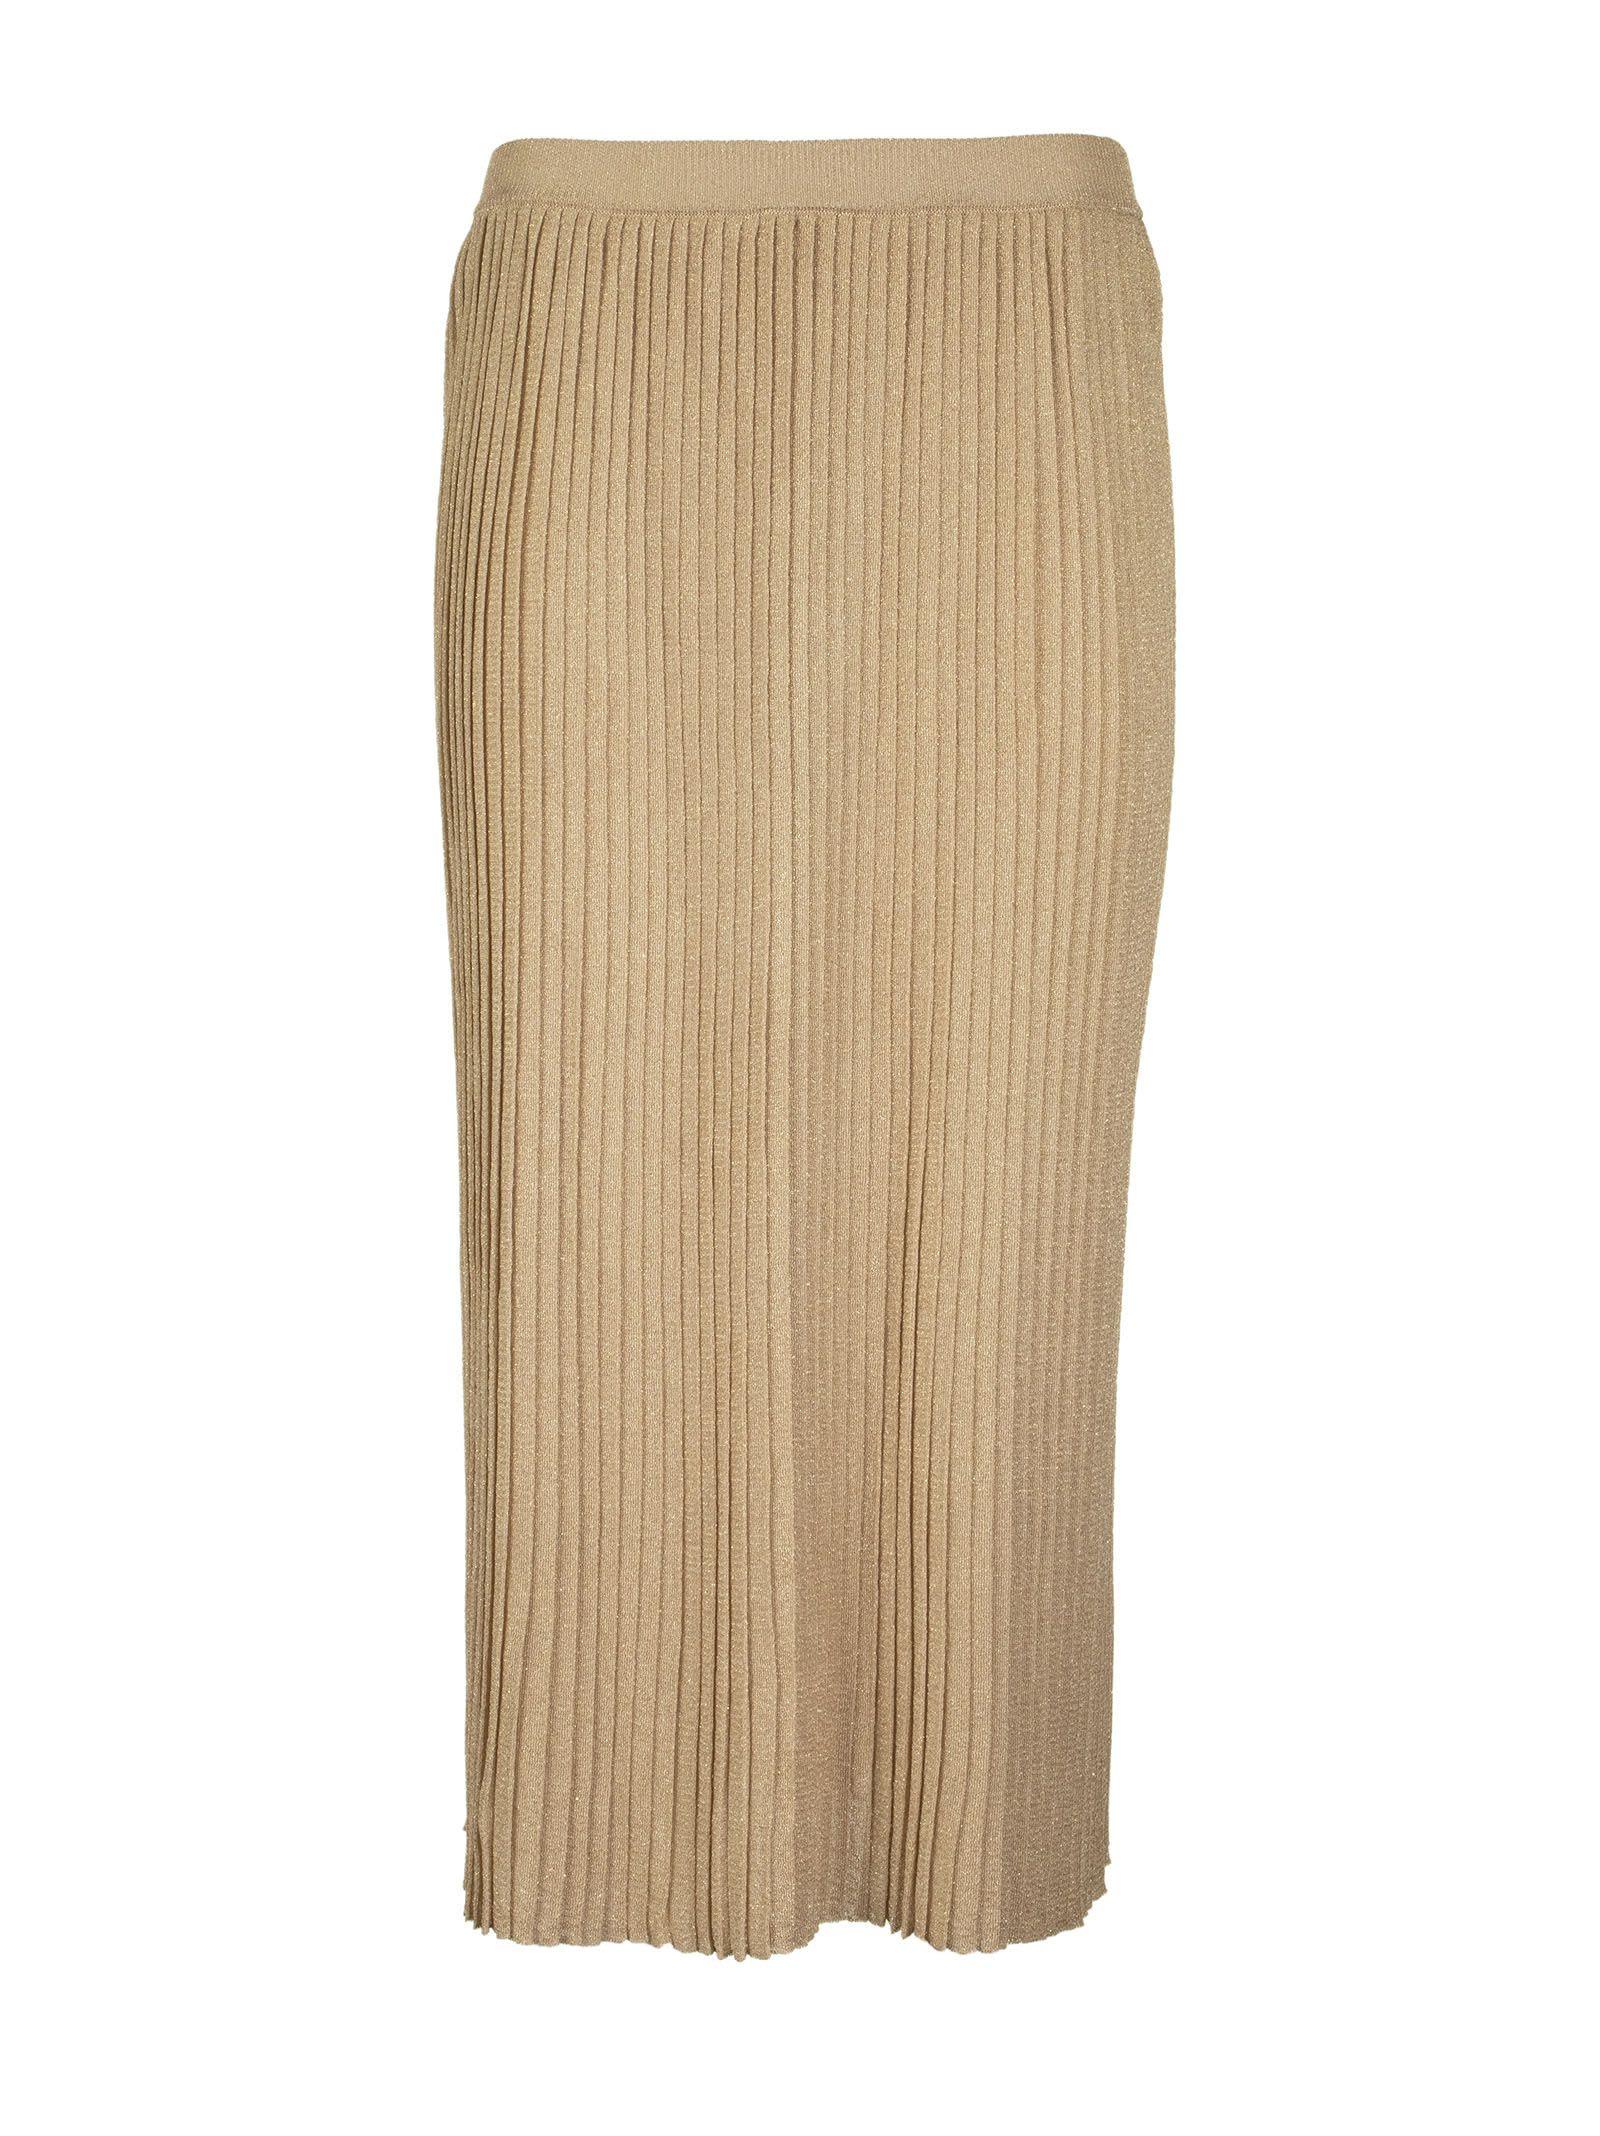 Elisabetta Franchi Pleated Skirt With High Waist